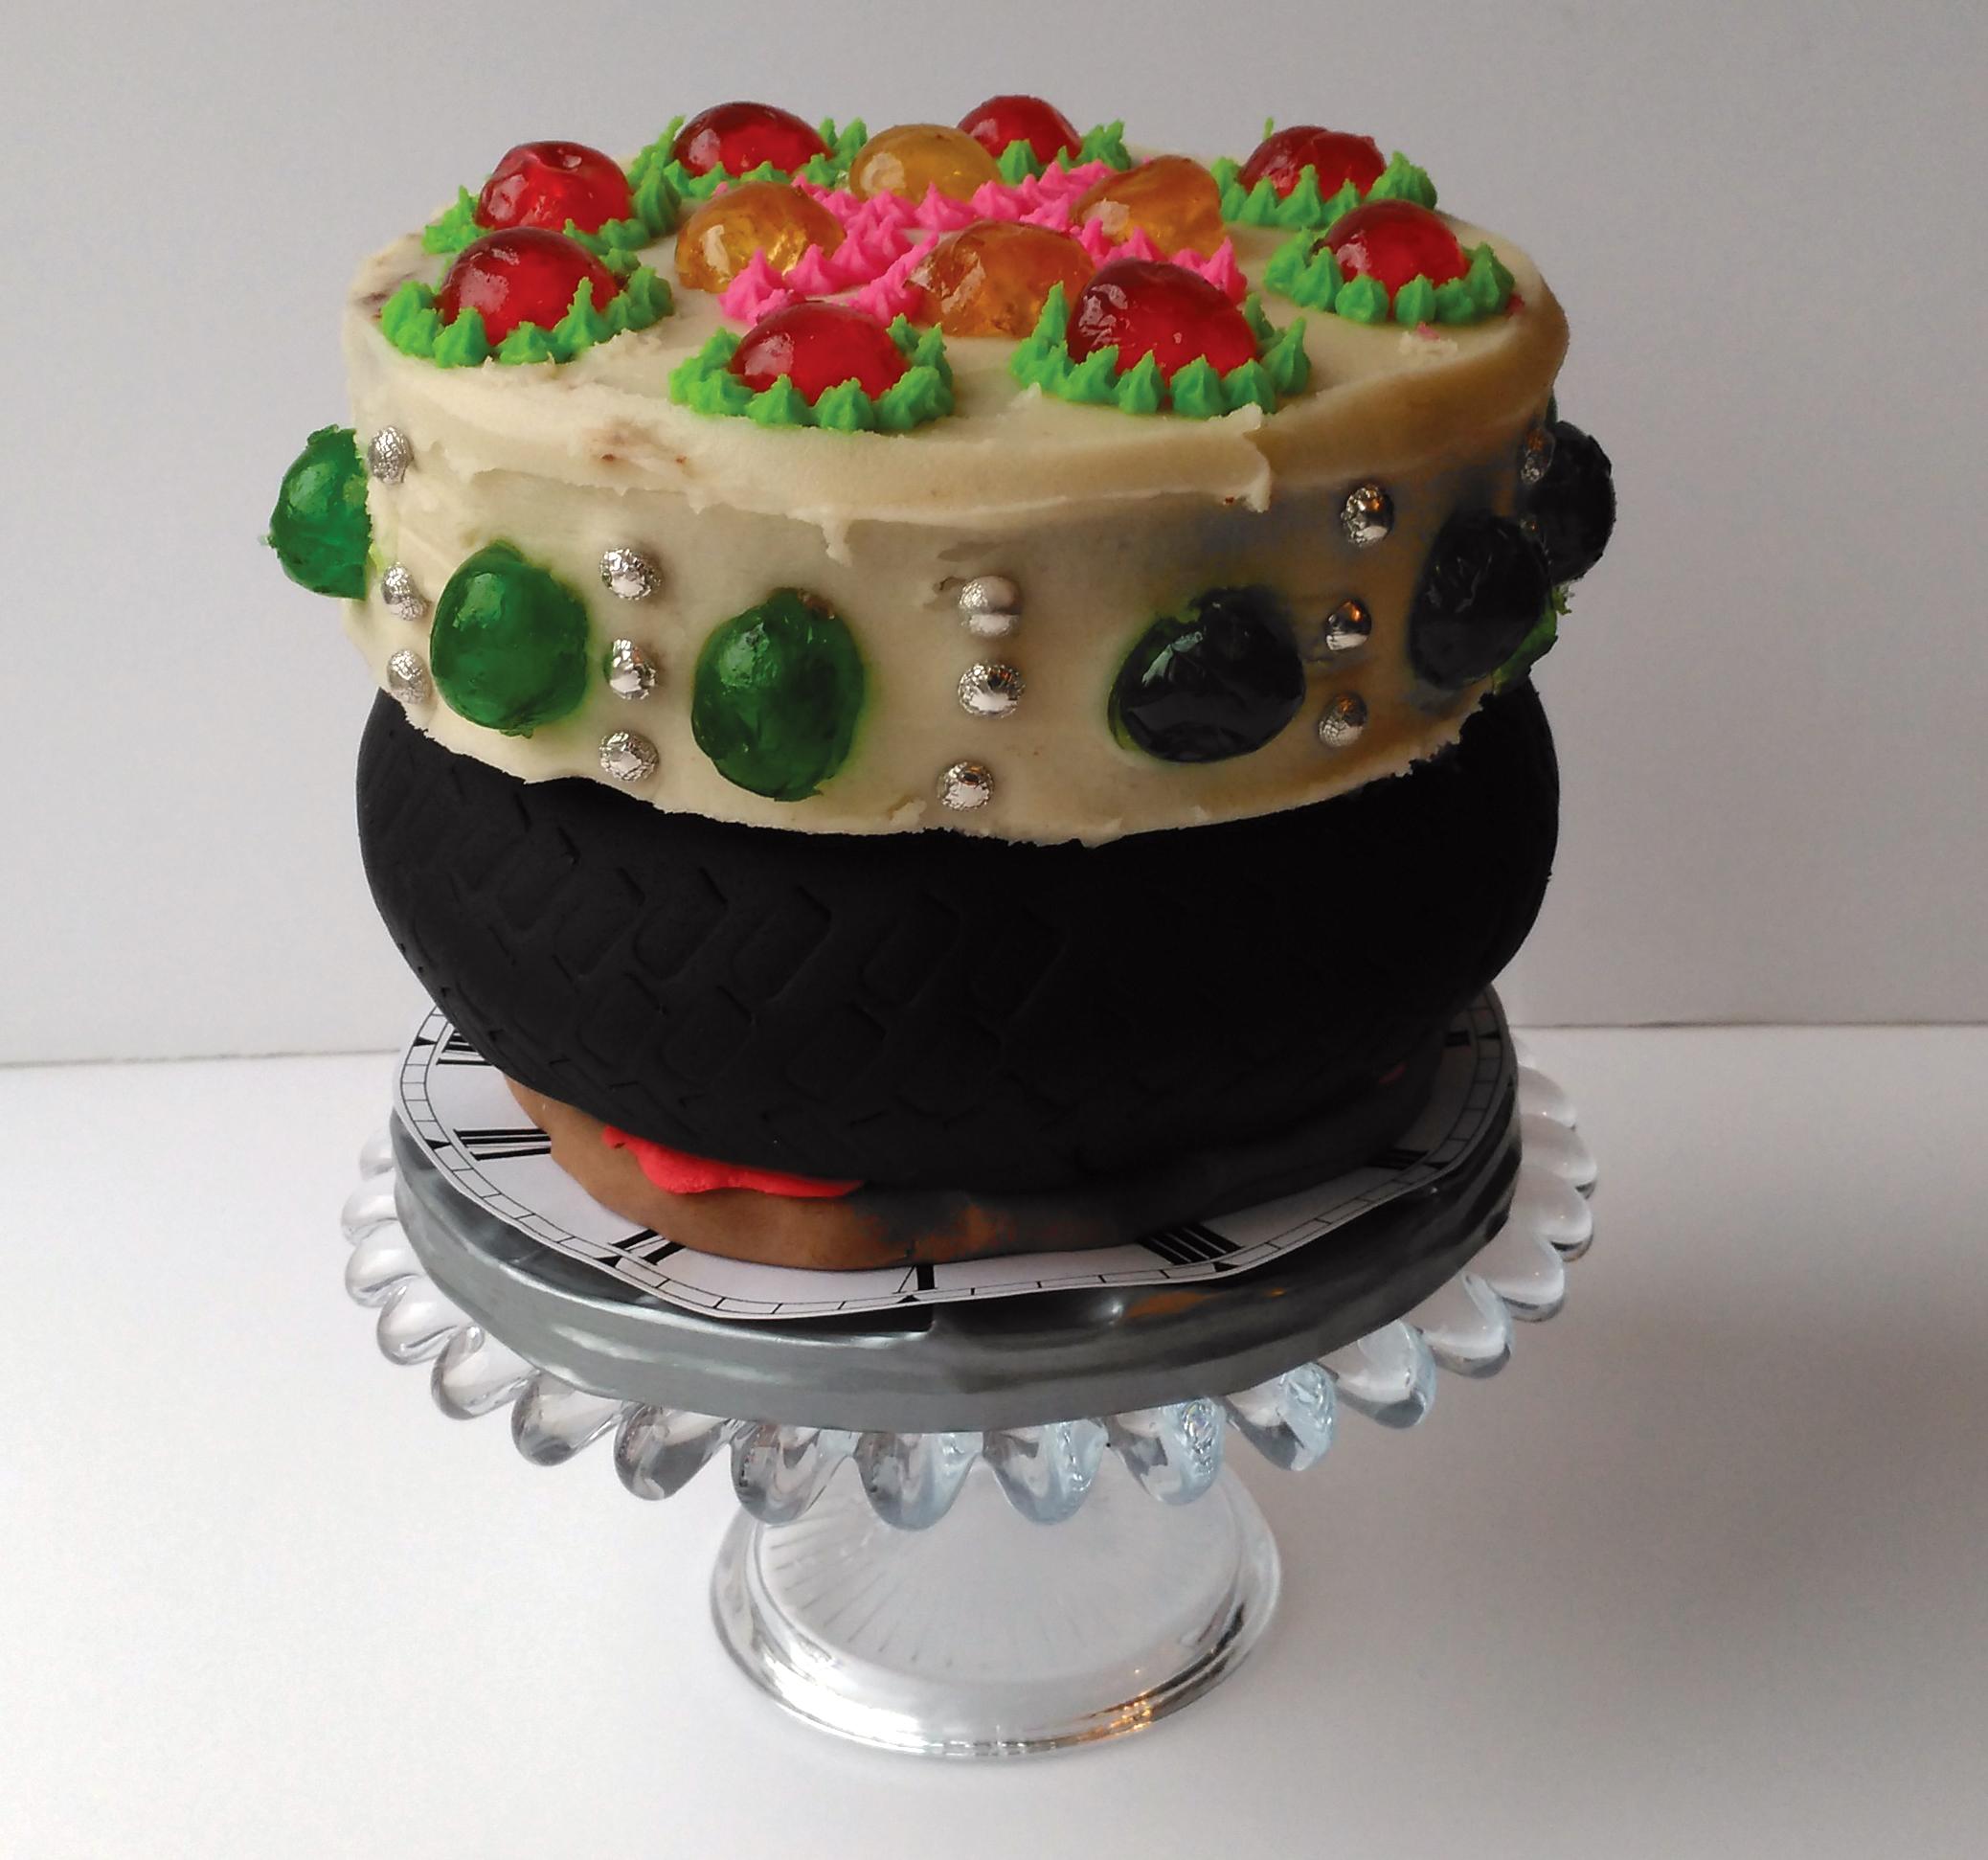 18. Cake!